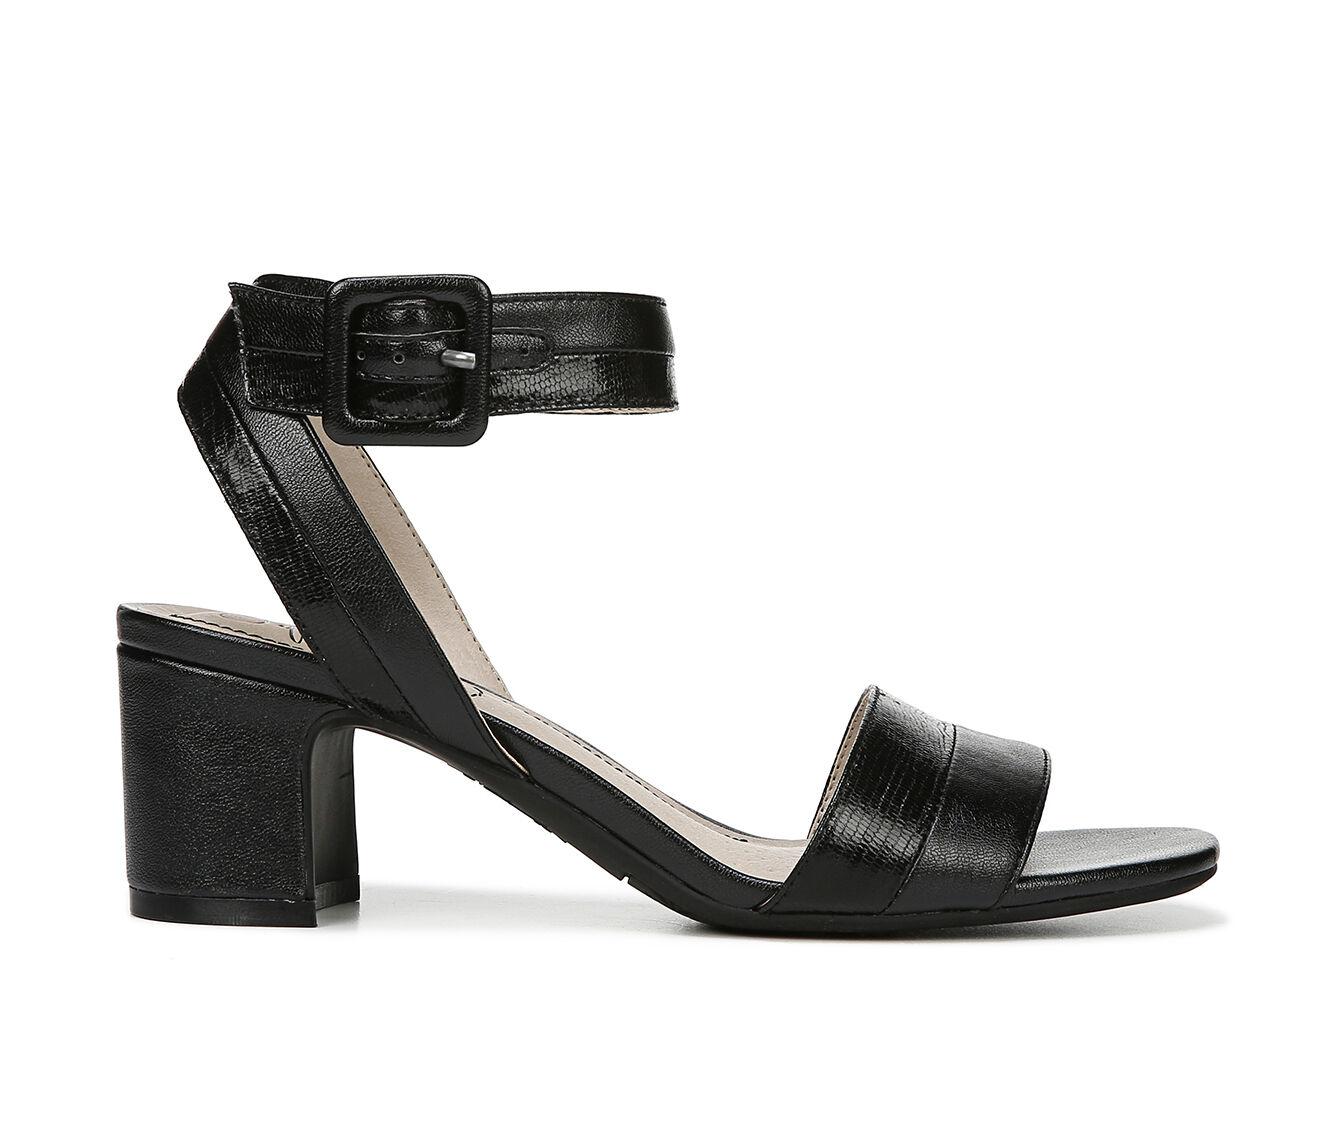 Leisure Styles Women's LifeStride Carnival Dress Sandals Black